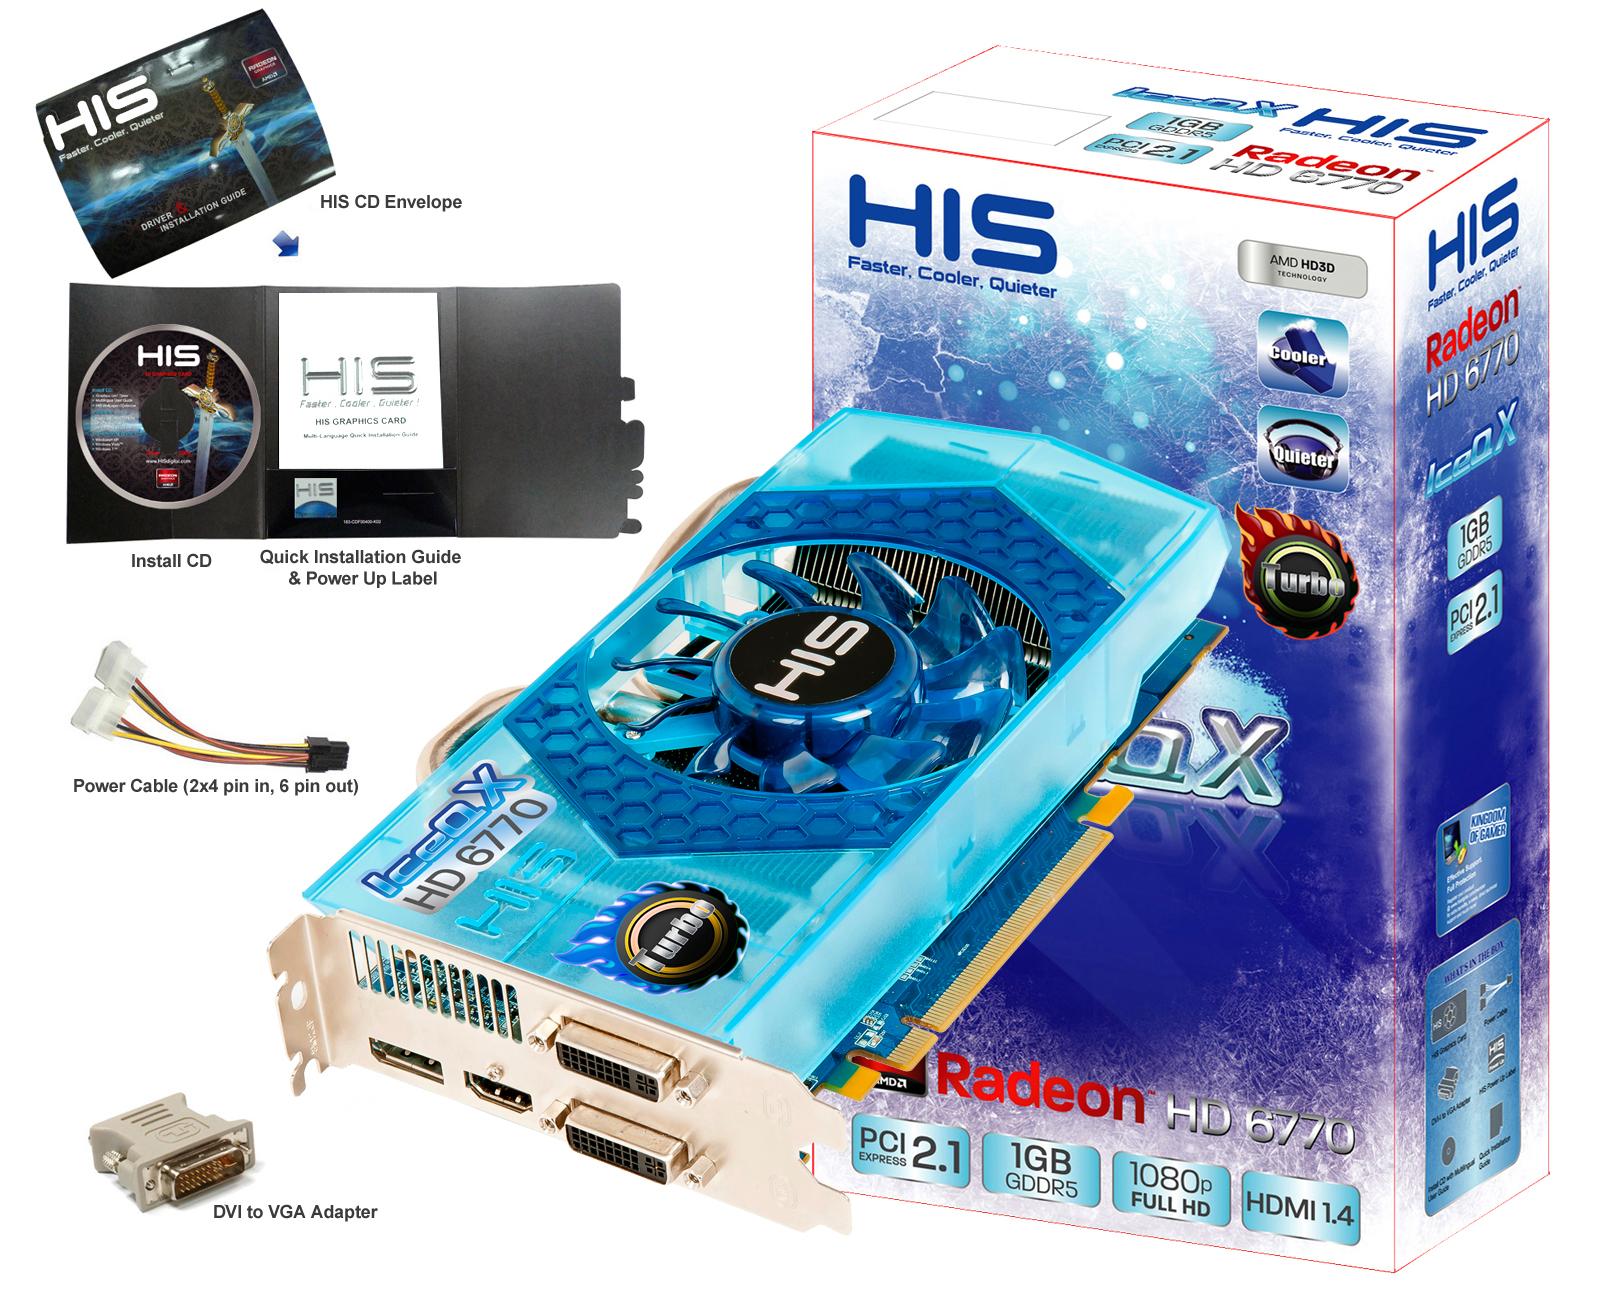 HIS 6770 IceQ X Turbo 1GB GDDR5 PCI-E DP/2xDVI/HDMI < HD 6700 Series